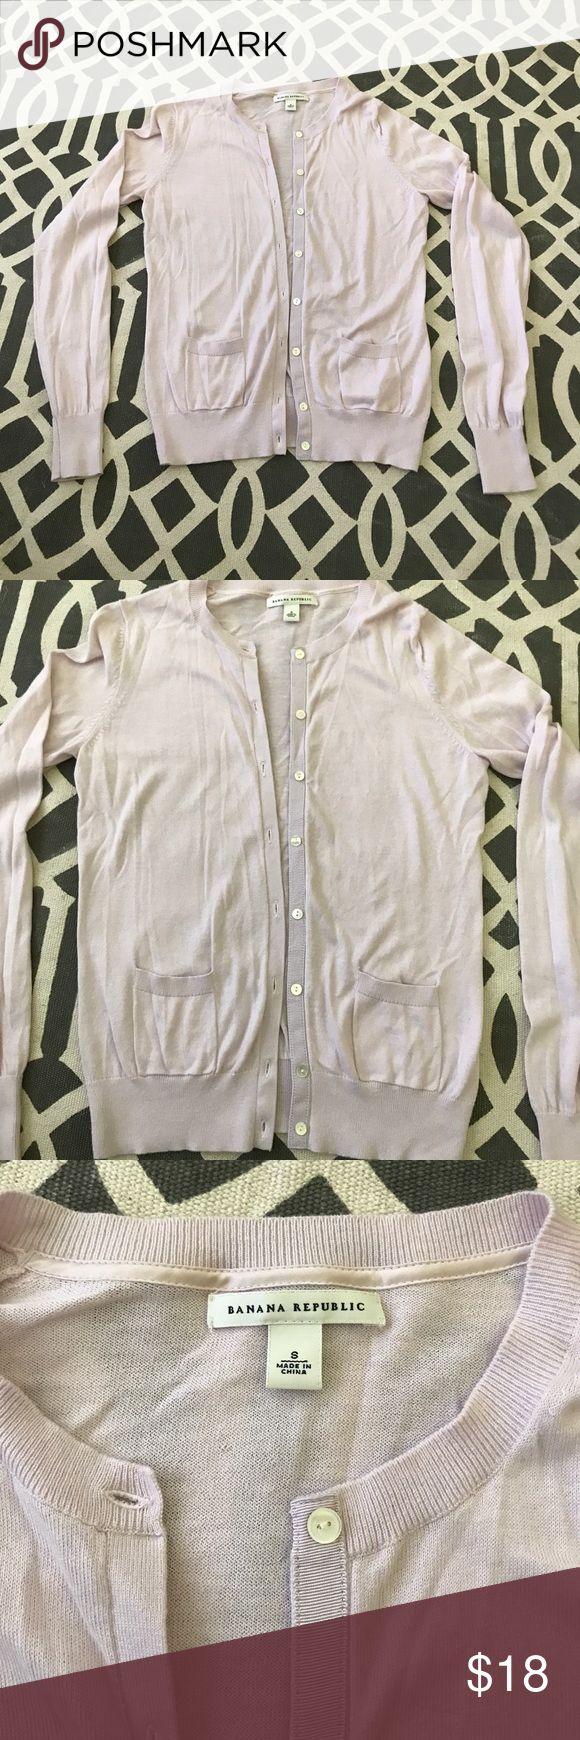 Banana republic light pink cardigan. Banana republic light pink cardigan, cotton/cashmere.  See you tag for fabric details. Size small. Banana Republic Sweaters Cardigans